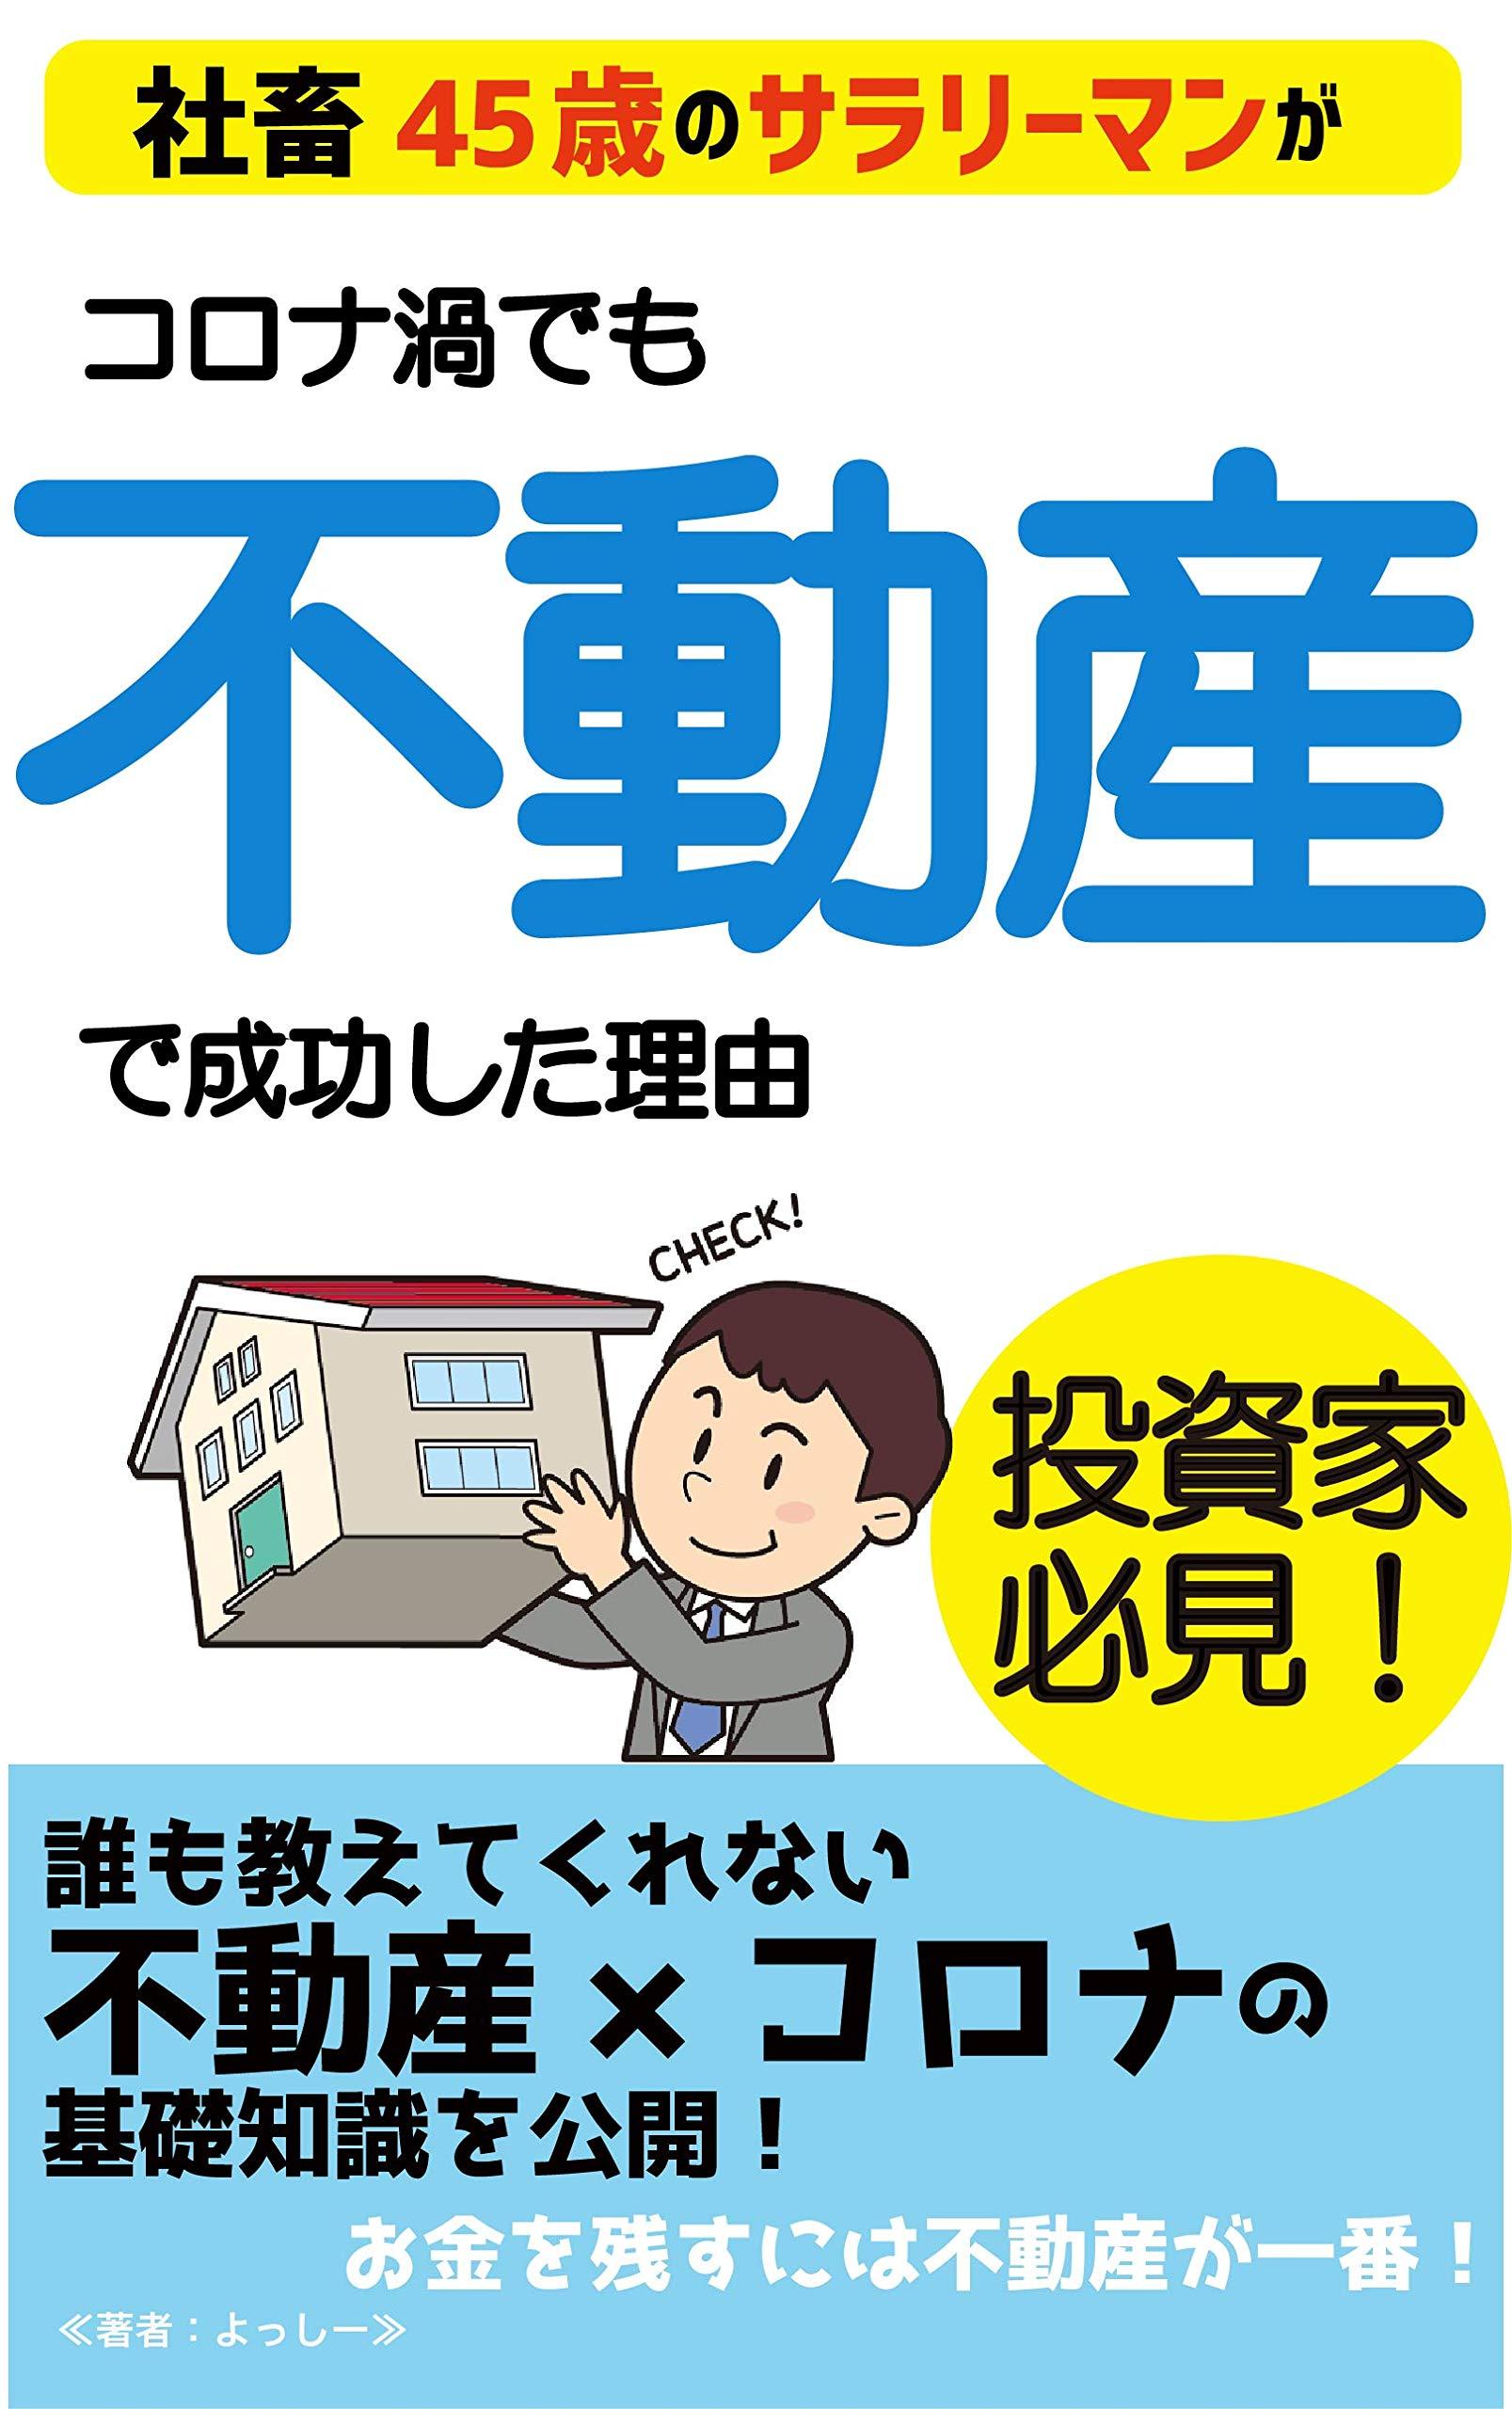 syatikuyonnjyuugosainosarari-manngakoronanakademohudousanndeseikoushitariyuu (Japanese Edition)